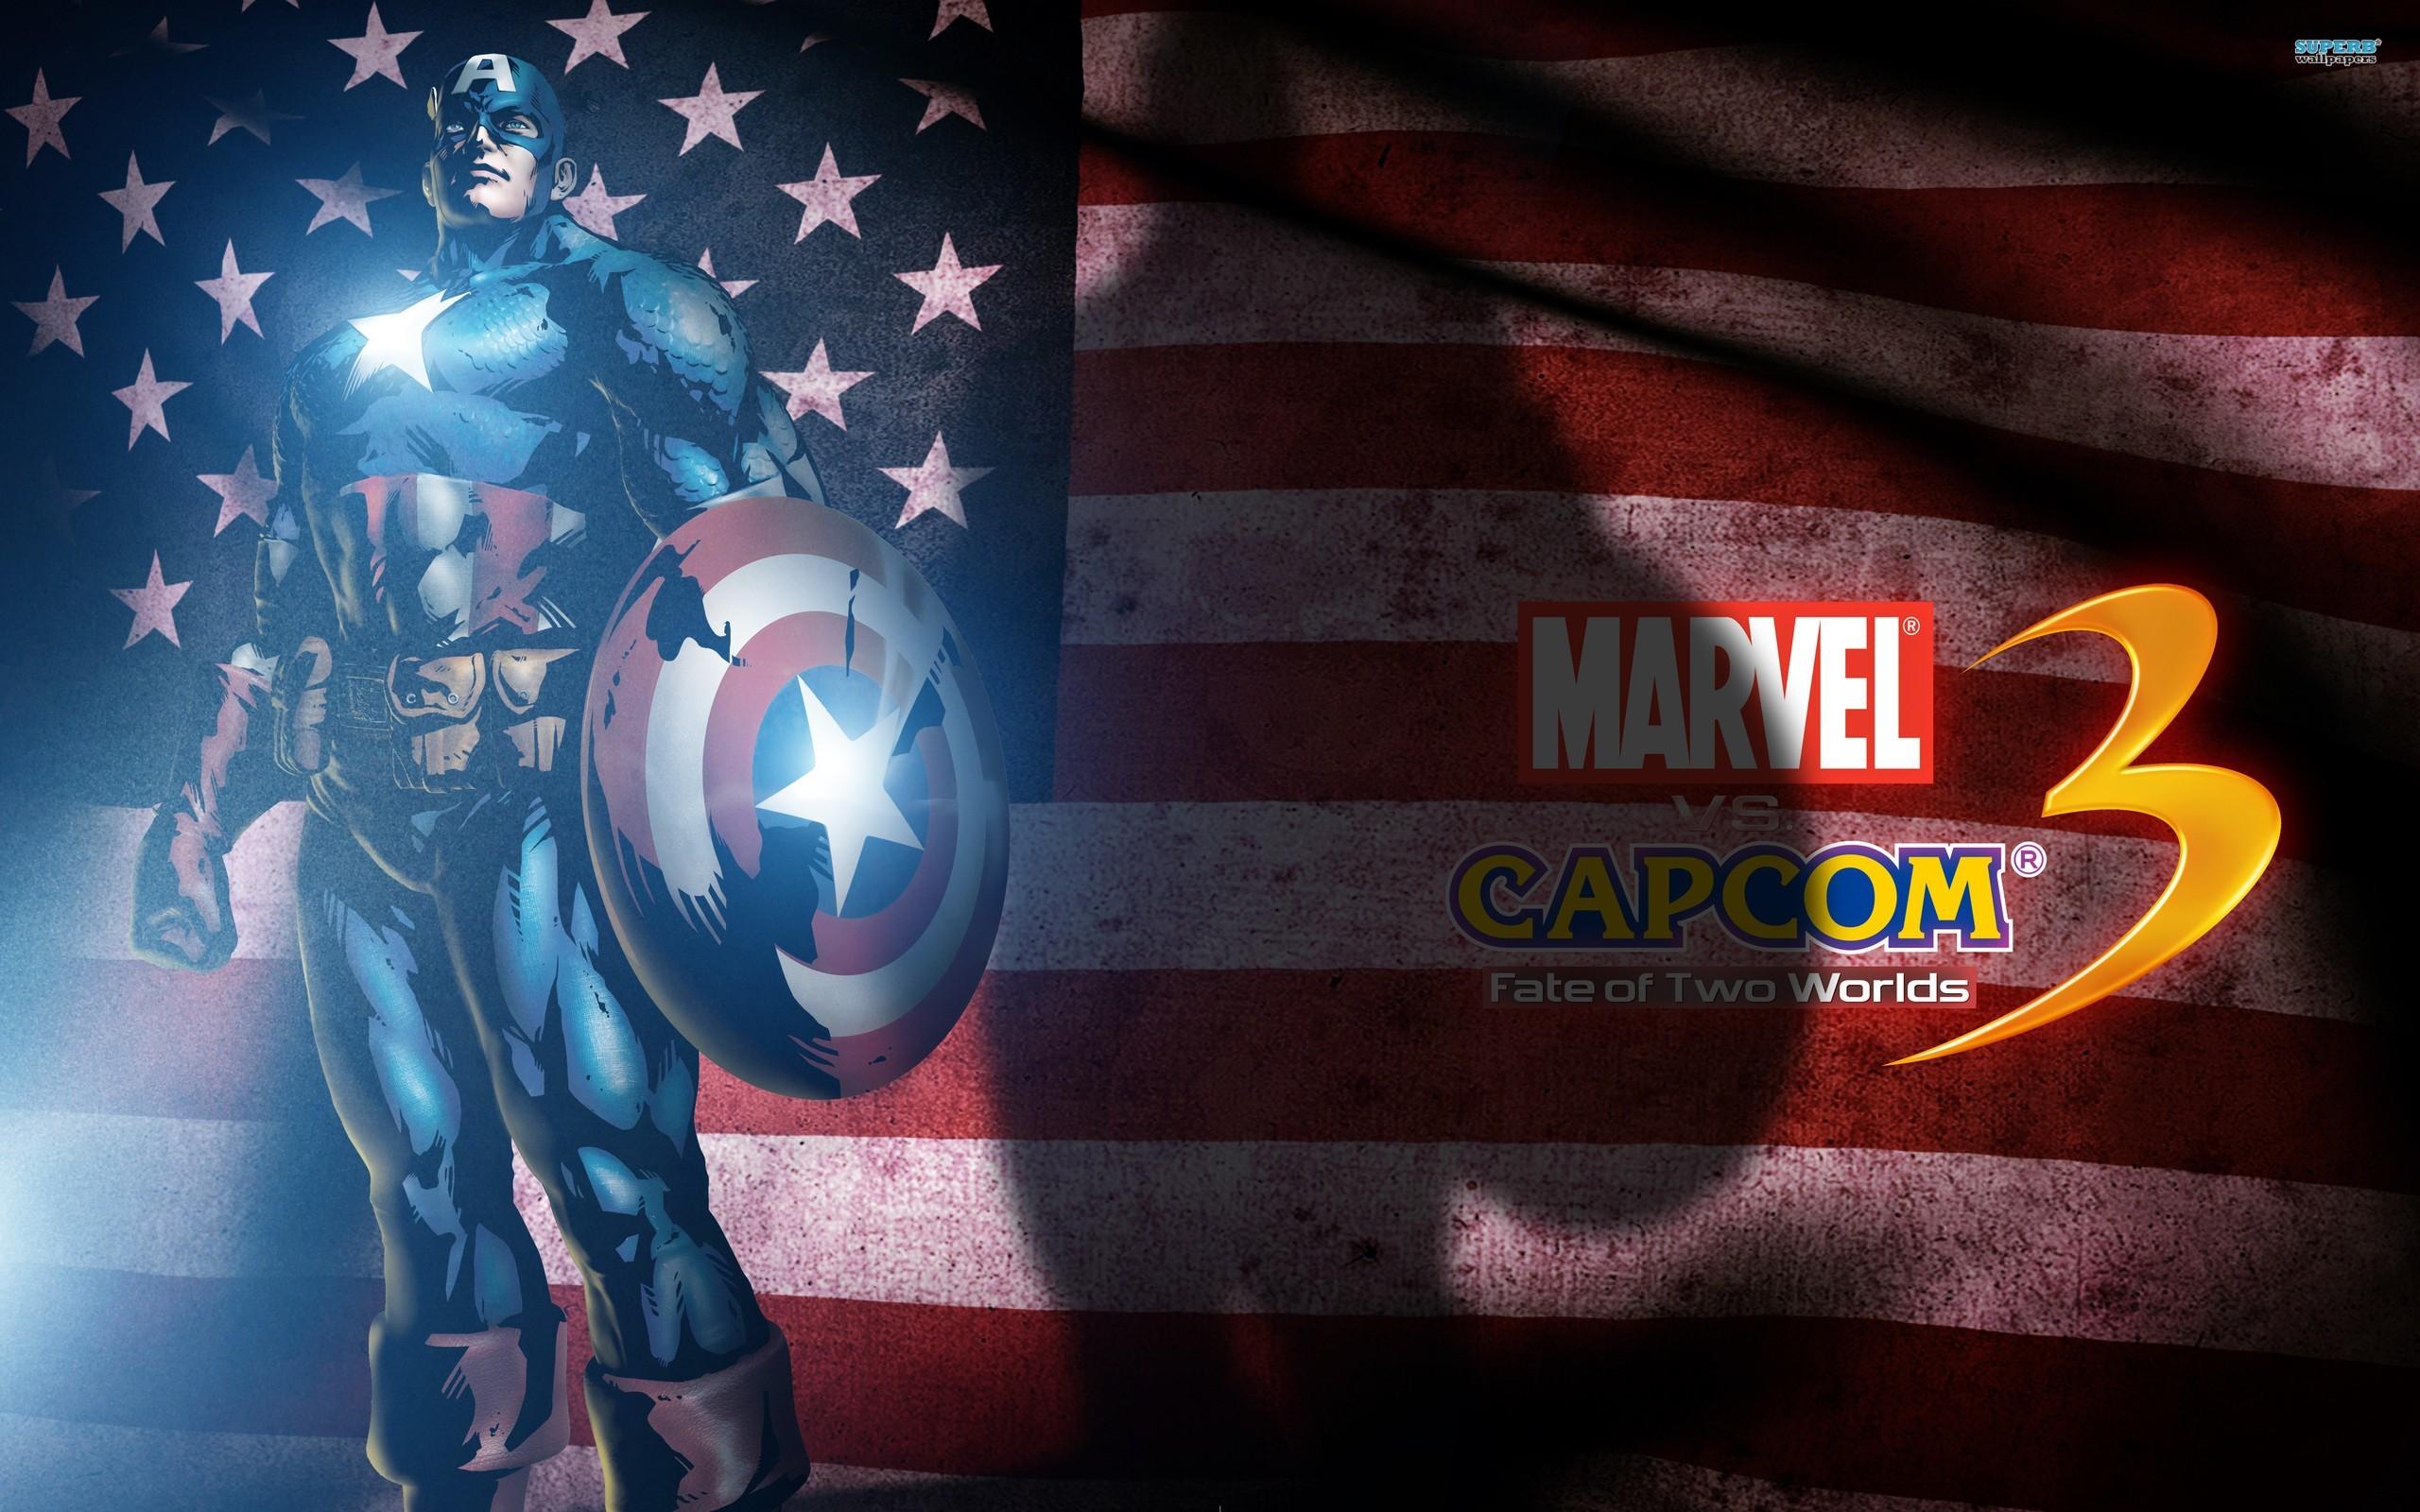 Marvel Comics, Hd Wallpaper, Chris Evans, Robert Downey Jr., The Winter